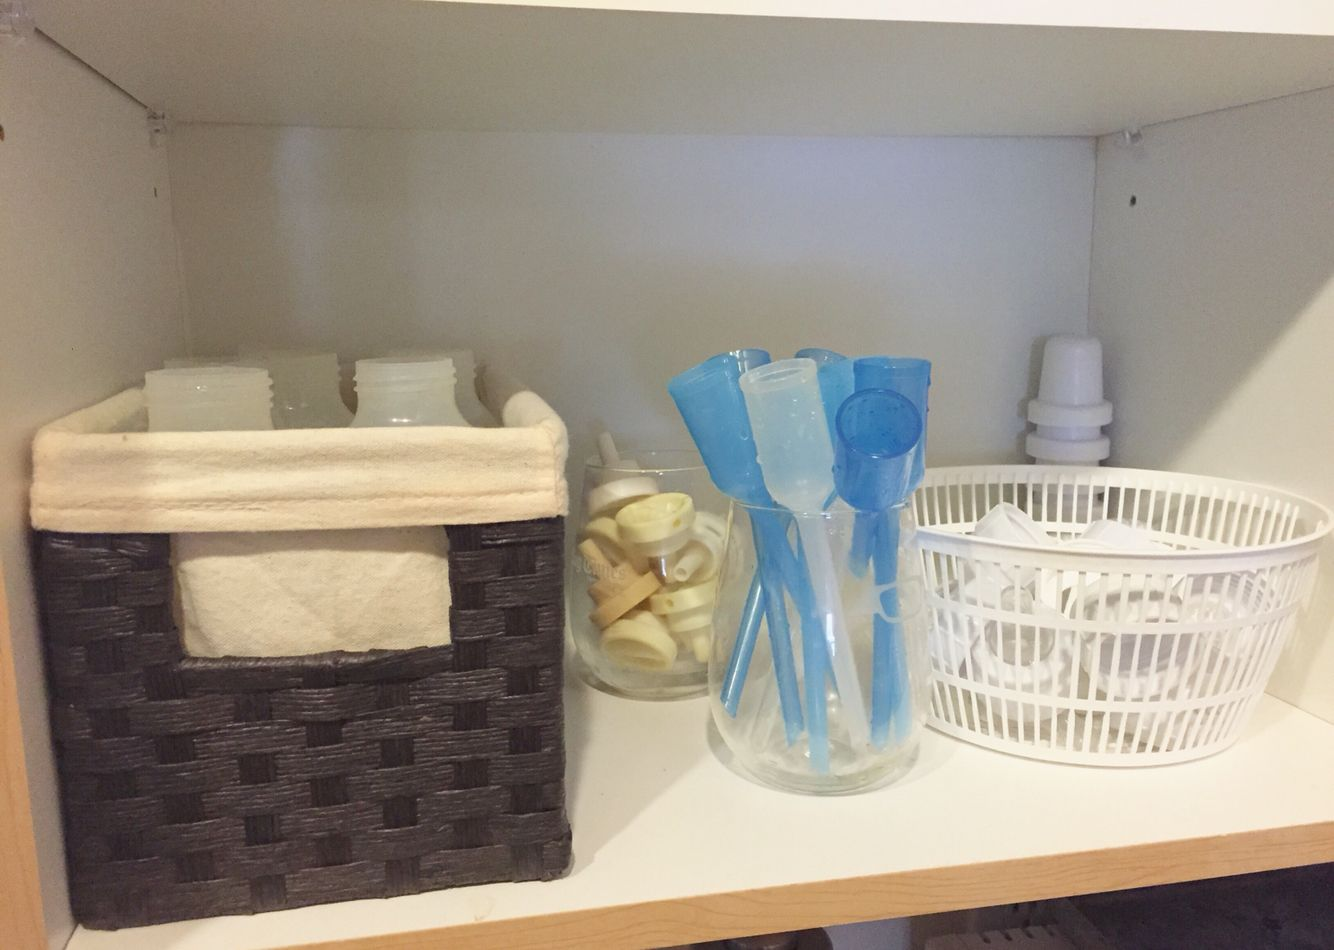 dr brown s bottle storage using stemless wine glasses pregnancy dr brown s bottle storage using stemless wine glasses